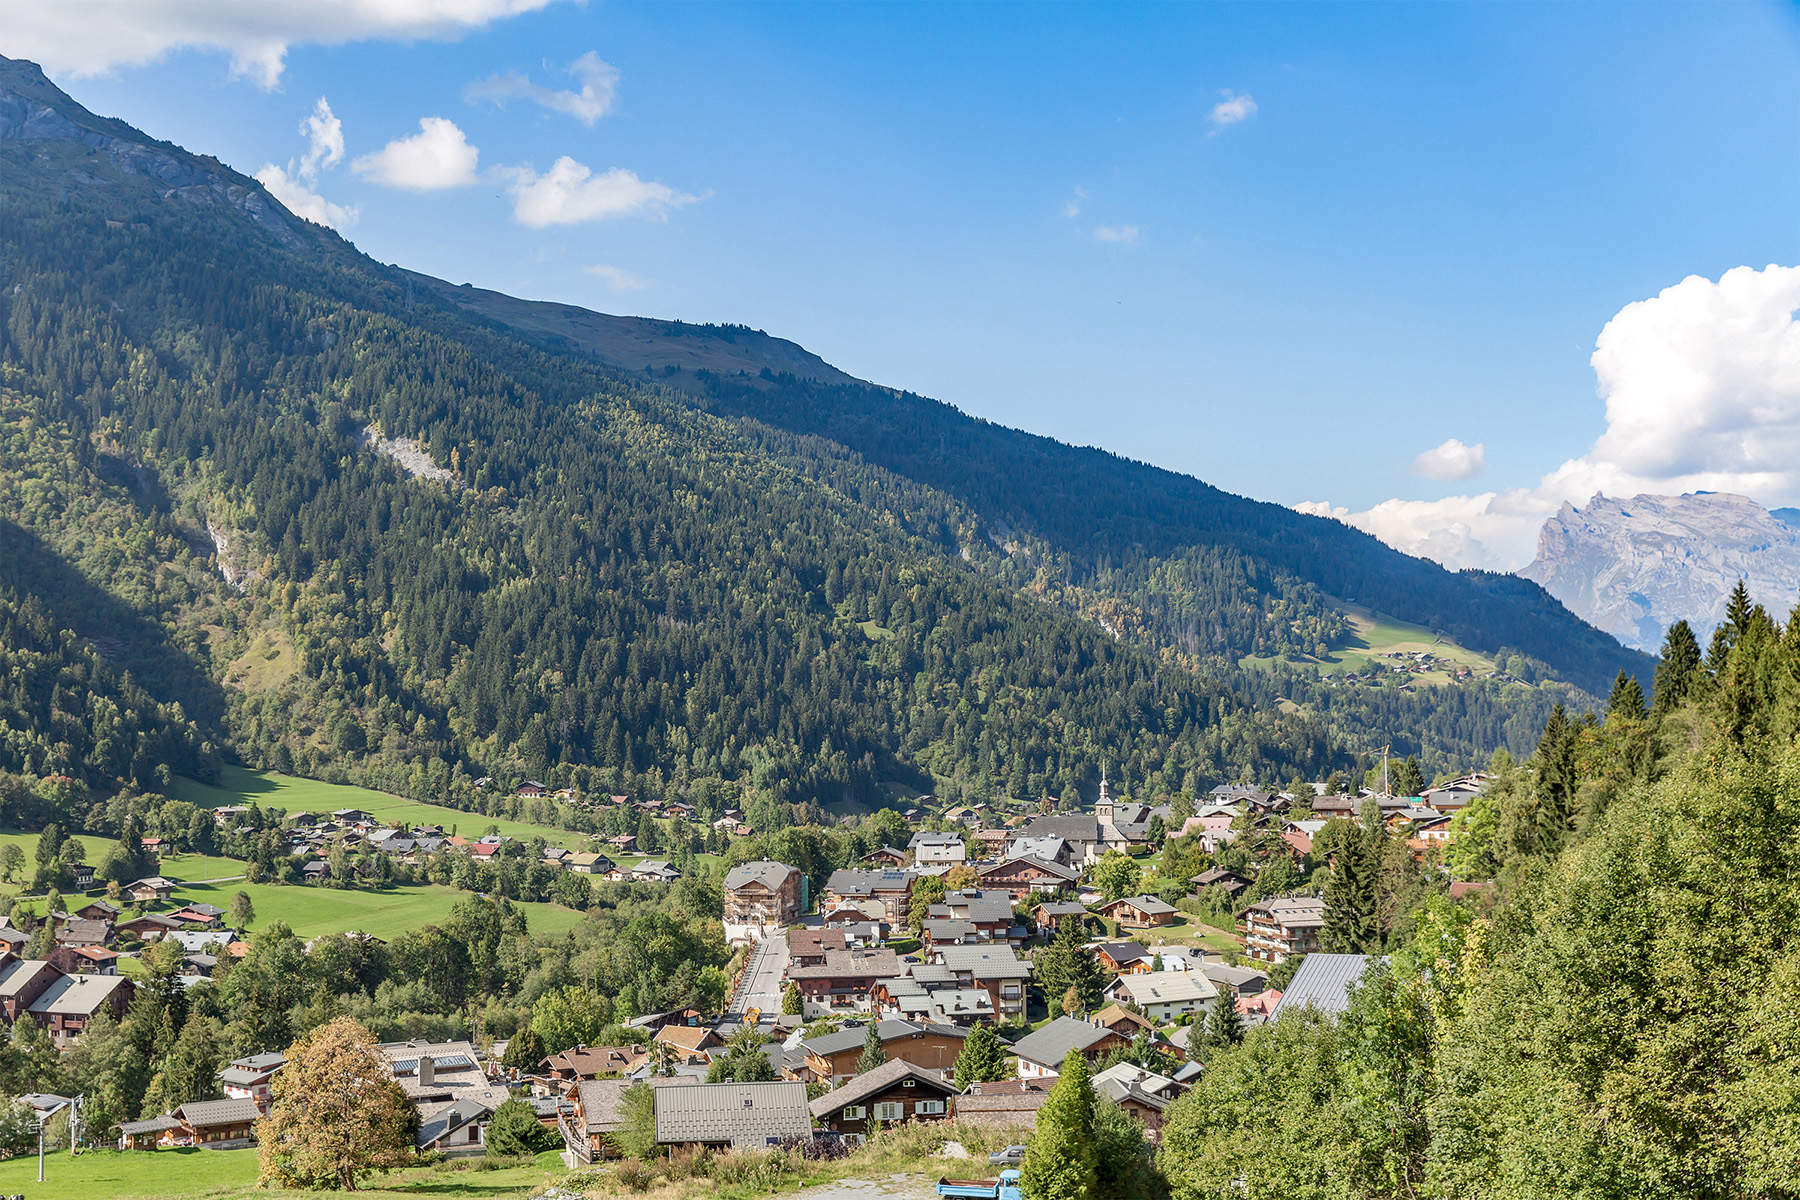 French Alps Village